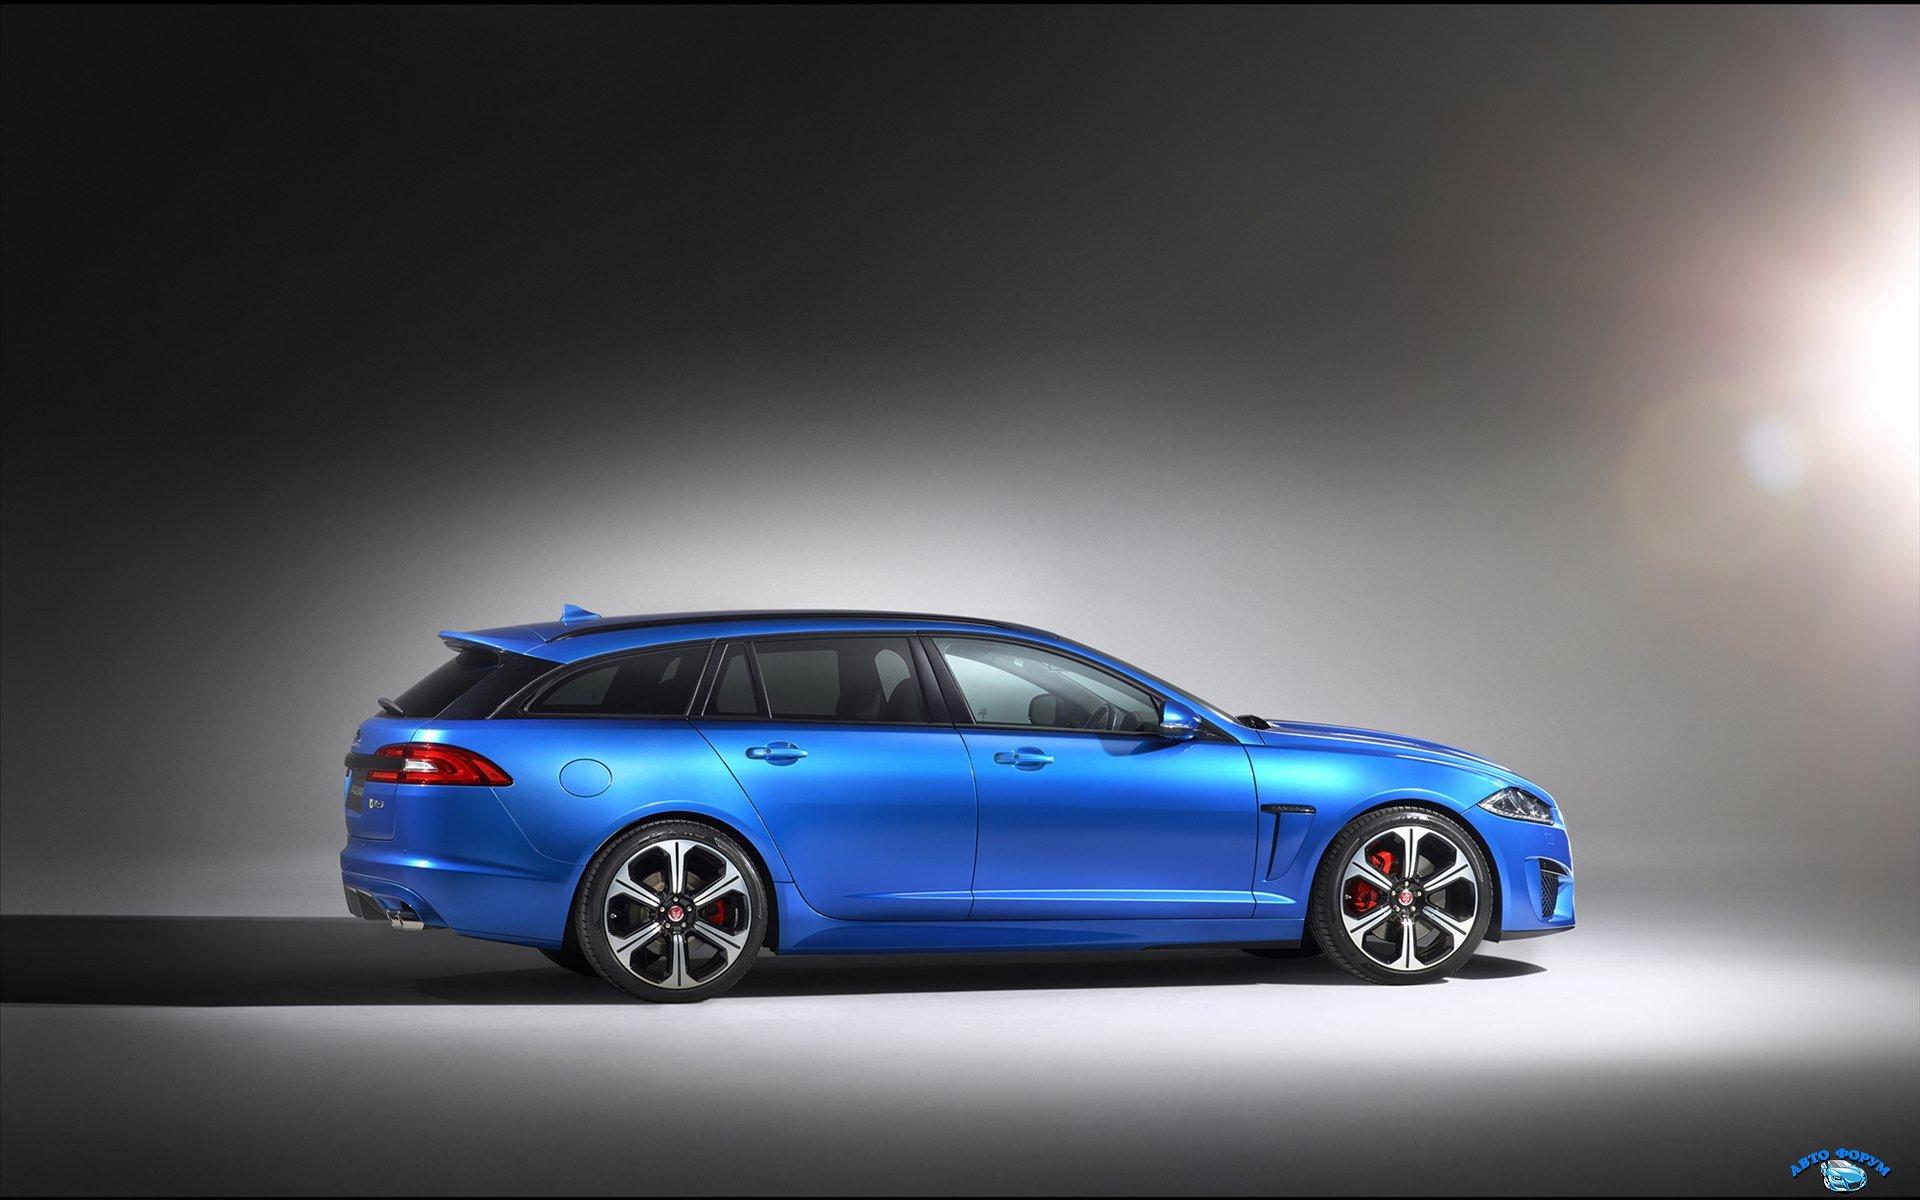 Jaguar-XFR-S-Sportbrake-2015-widescreen-30.jpg